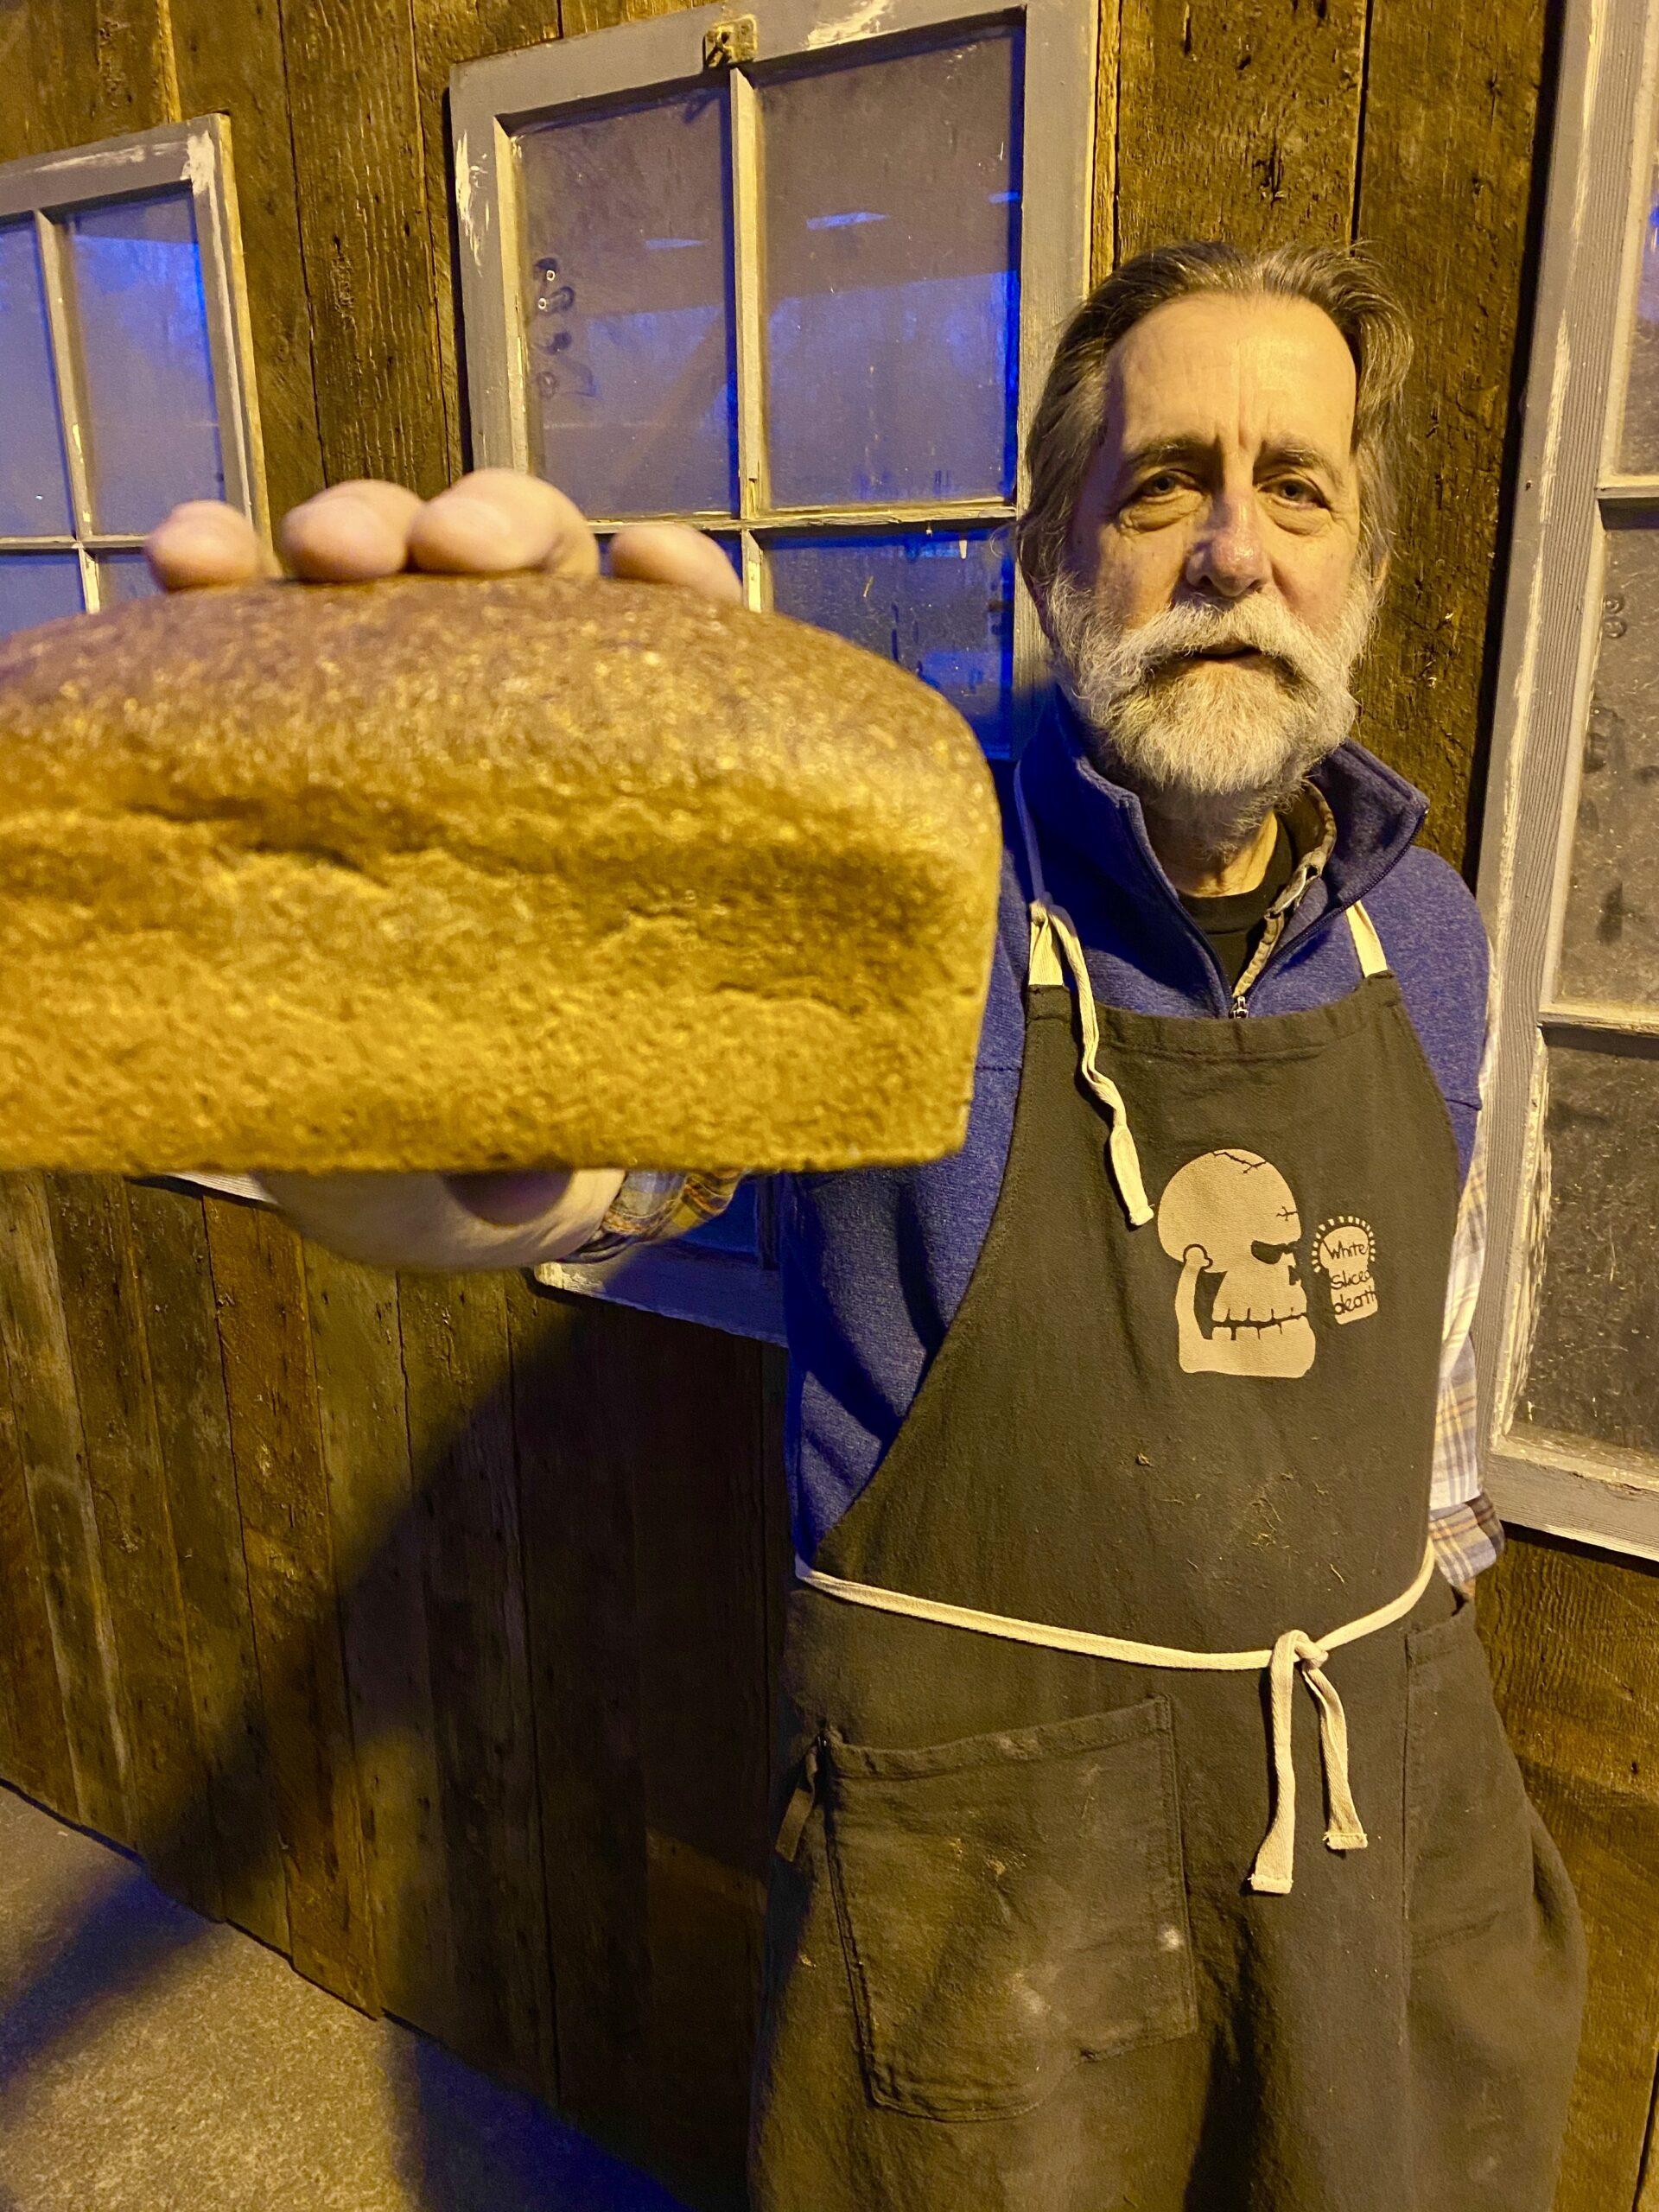 Stephen Jones holding a loaf of bread